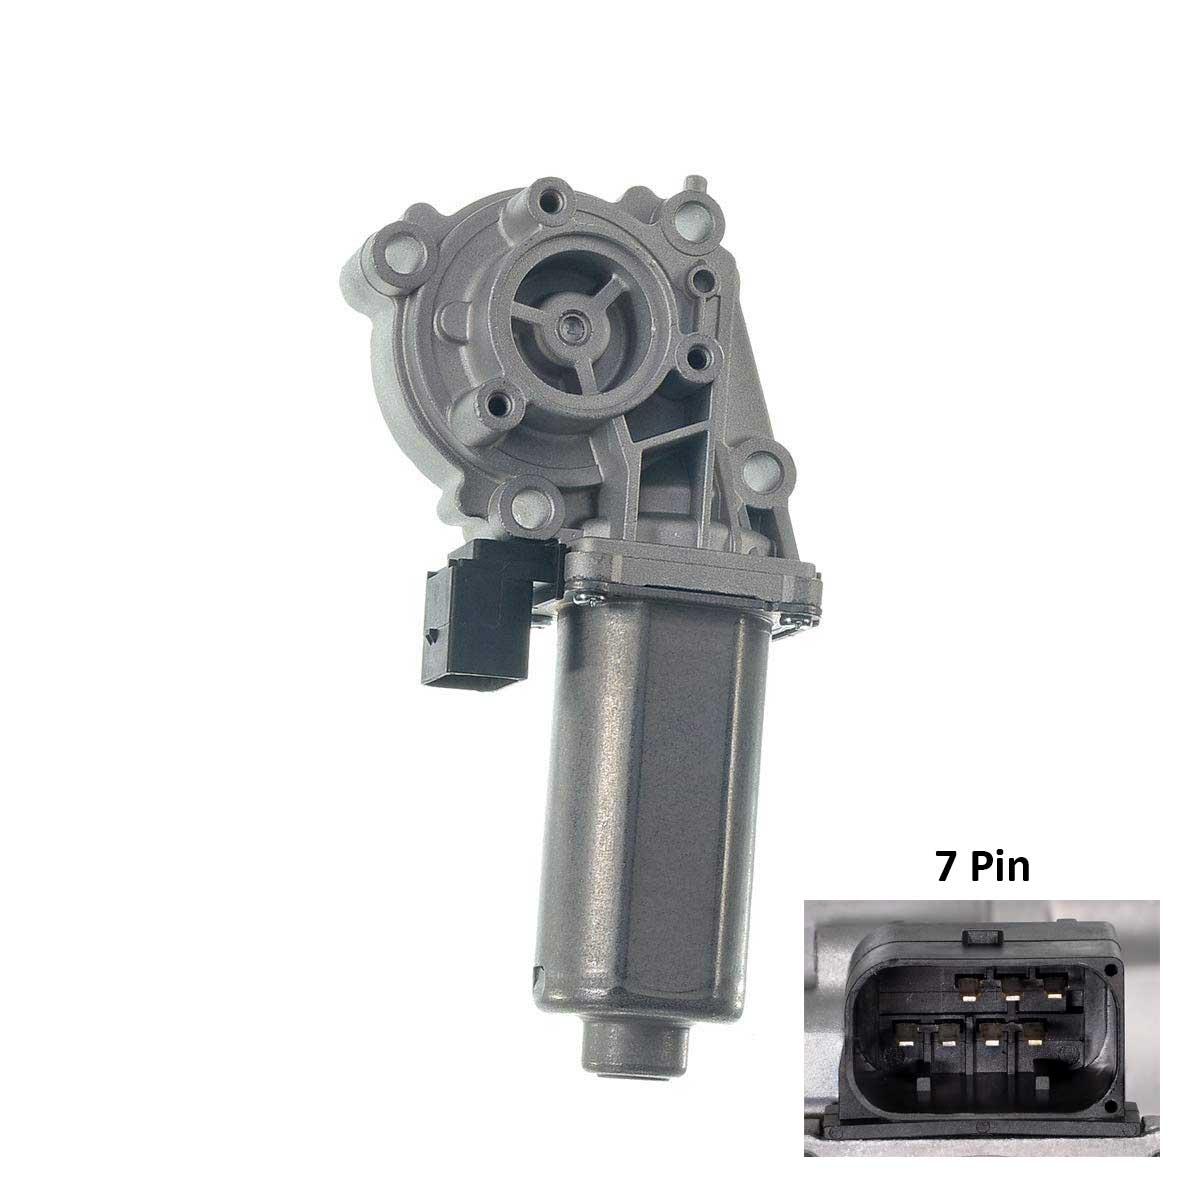 American Shifter 524778 Shifter 4L60E 23 Trim Kit CHR Push Button TN Boot Billet Knob for F4461